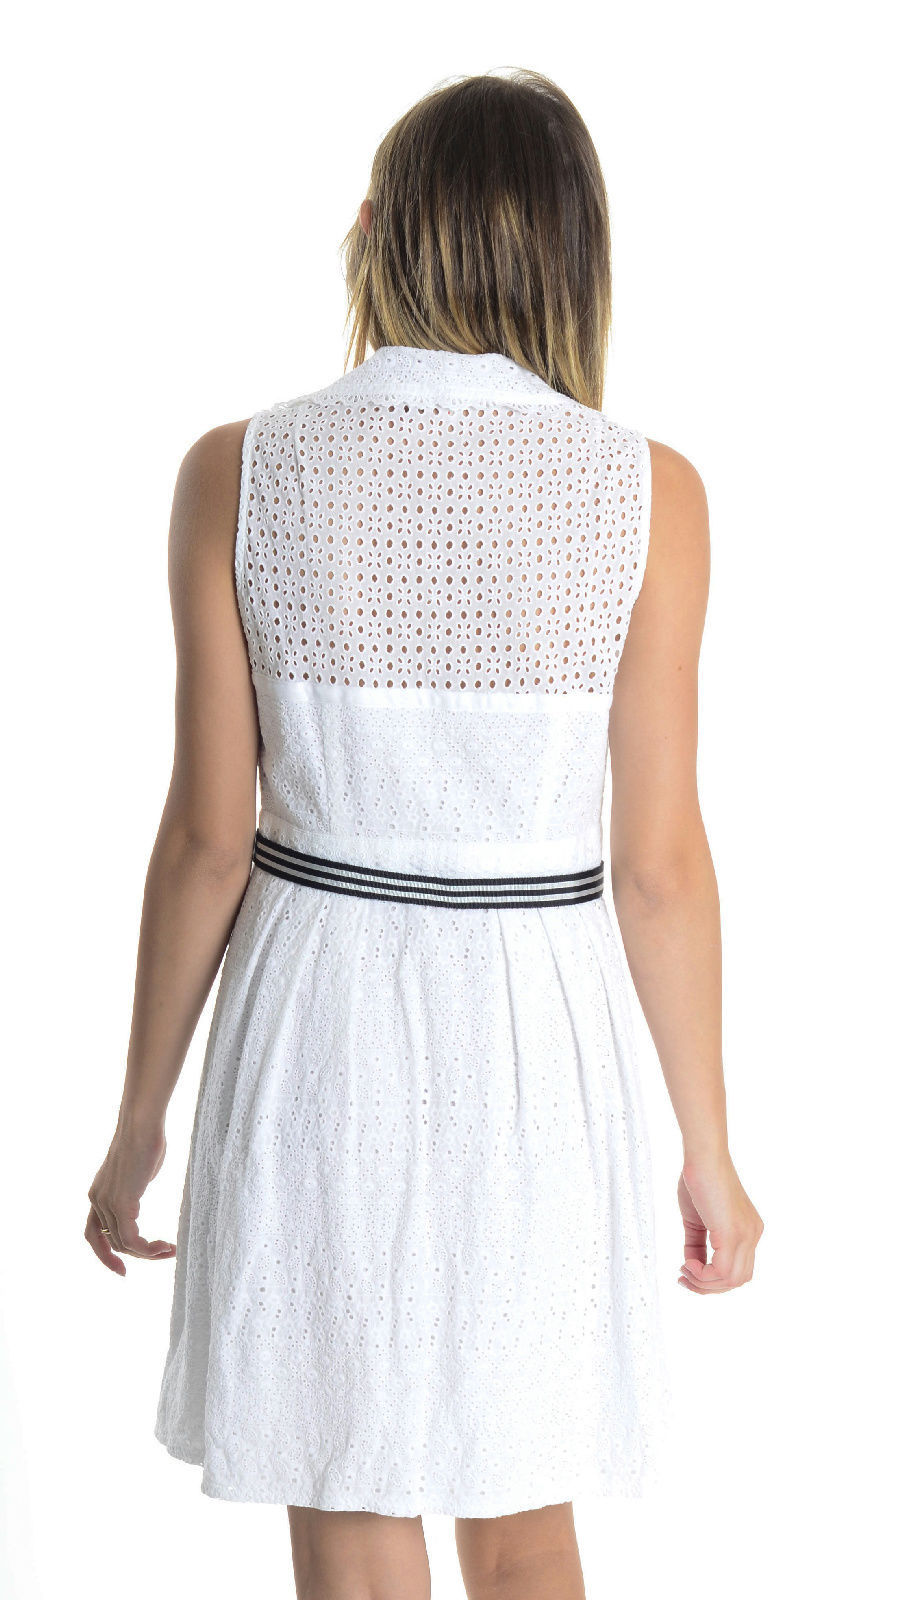 6 Nanette Lepore White Eyelet Lace Sweetheart Neckline Collared Sleeveless Dress